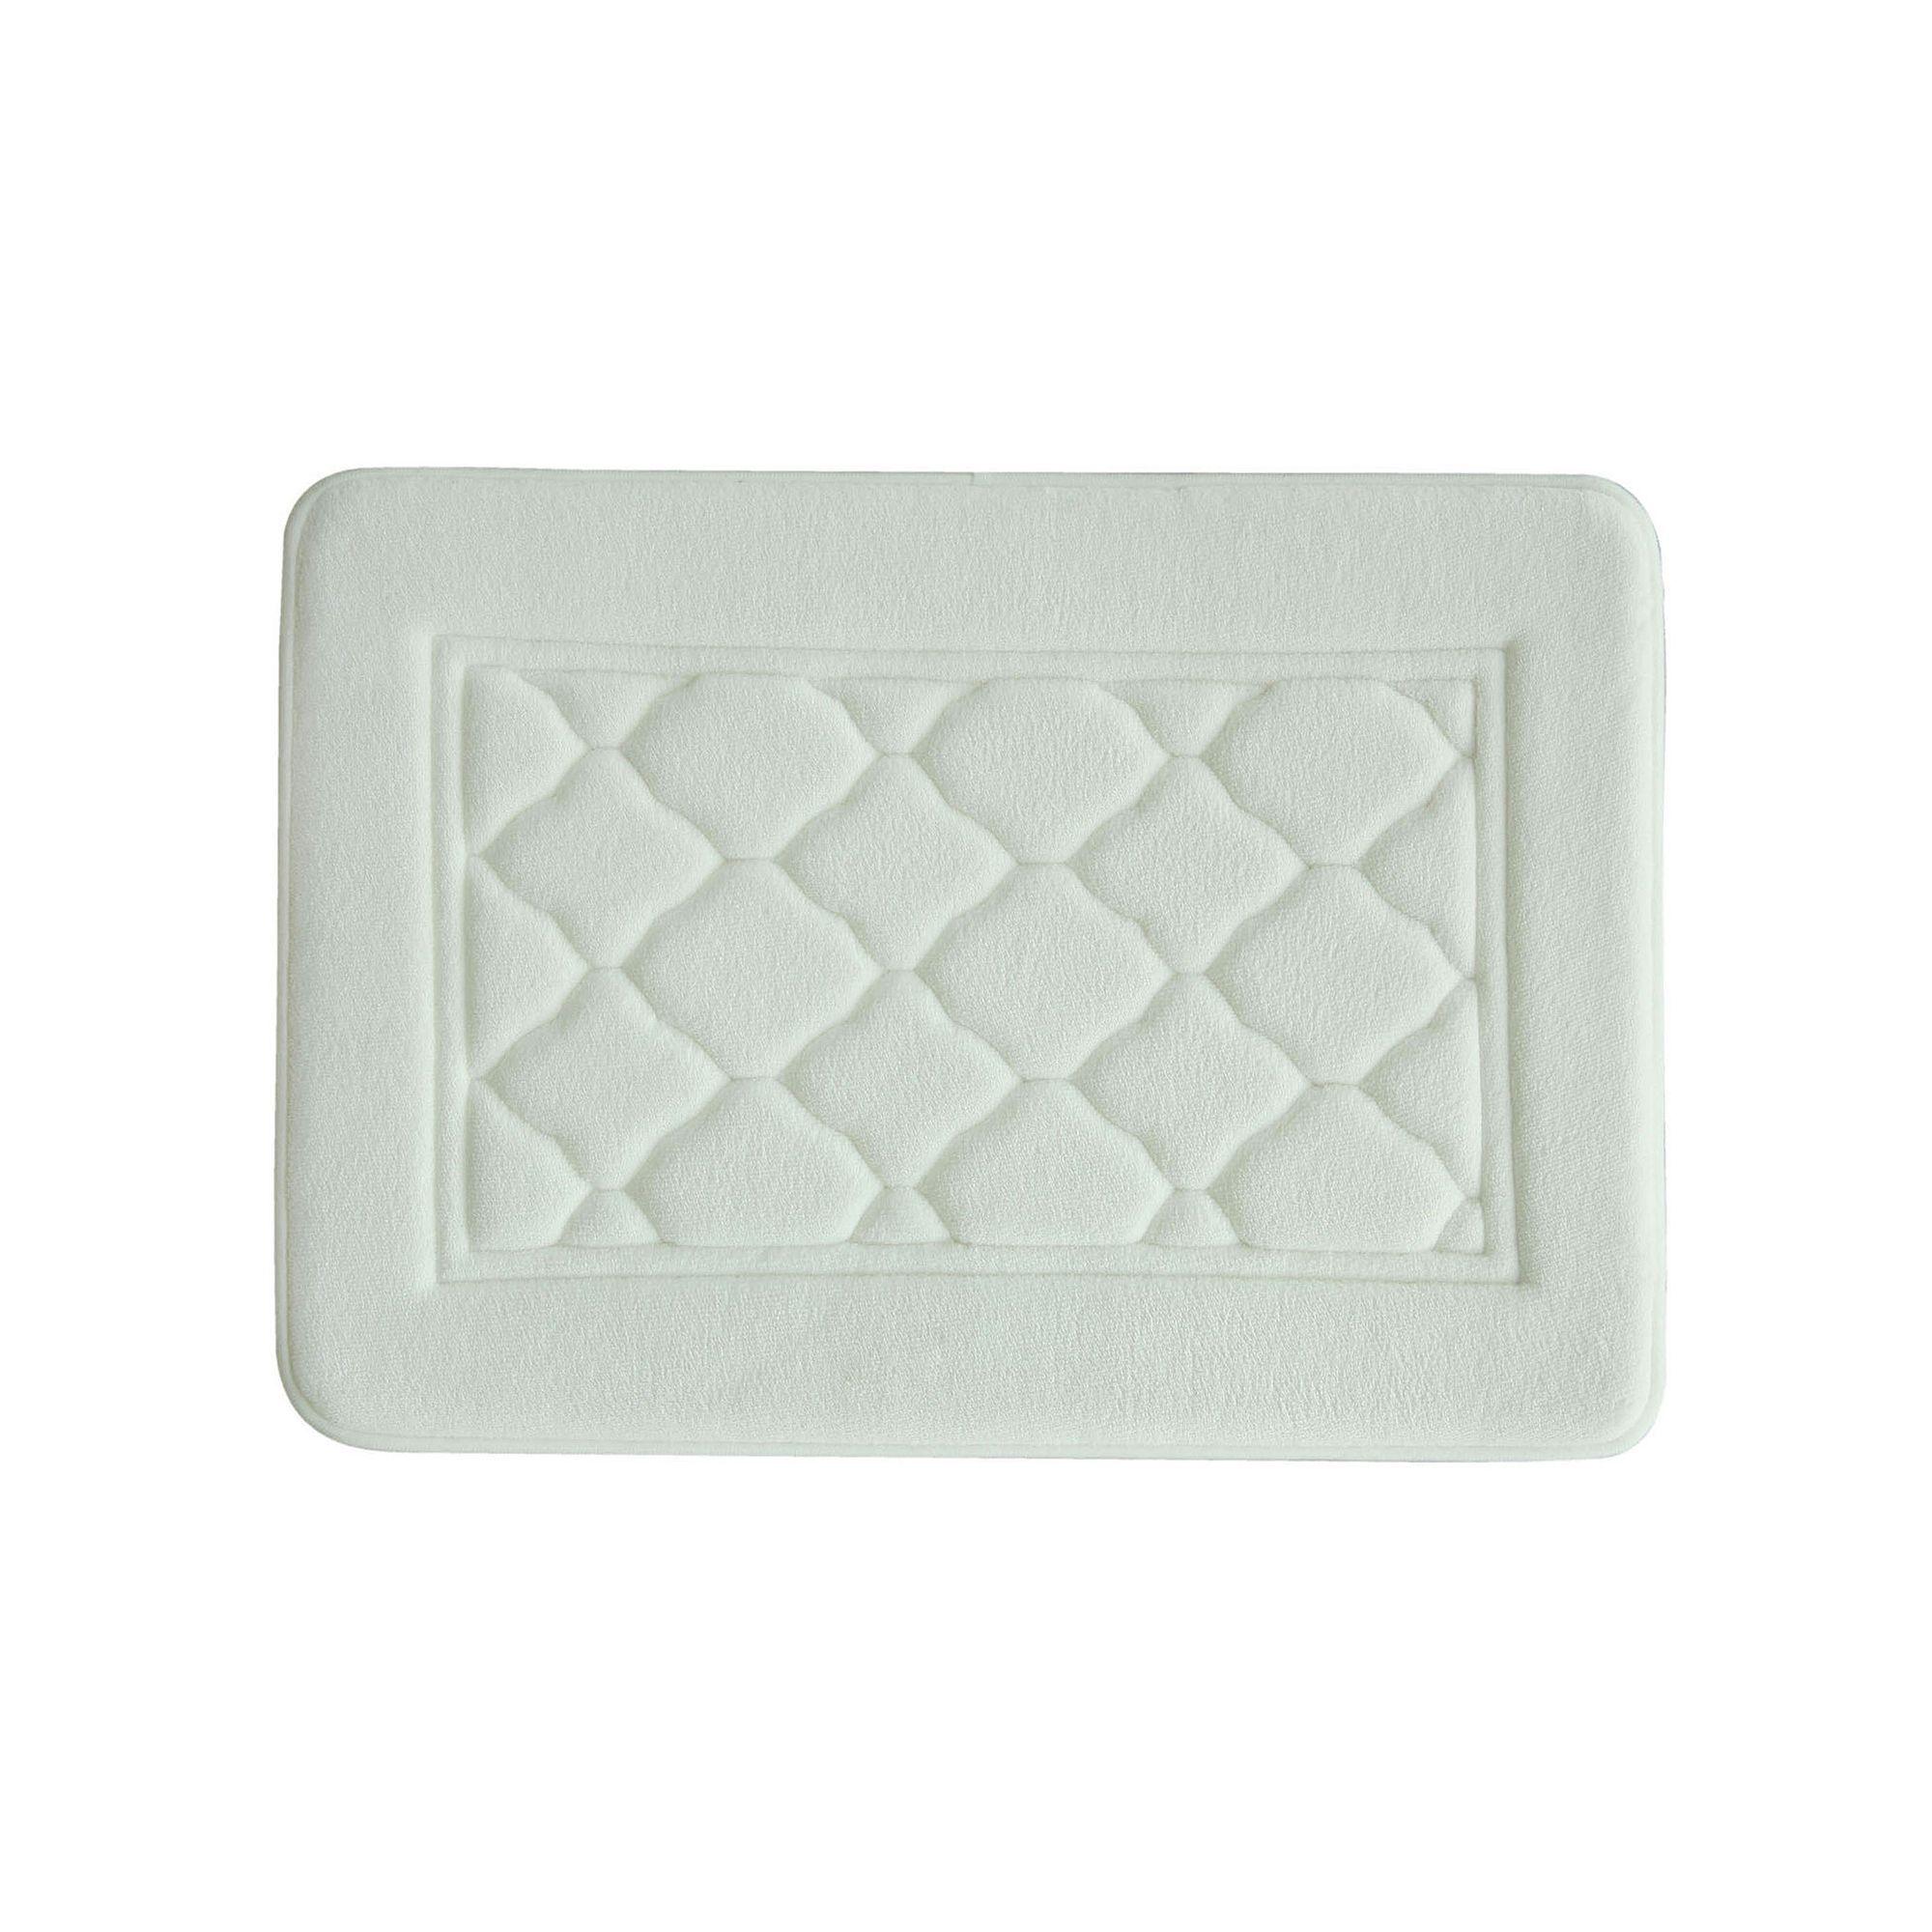 Bacova Florence Microban Antimicrobial Memory Foam Bath Rug